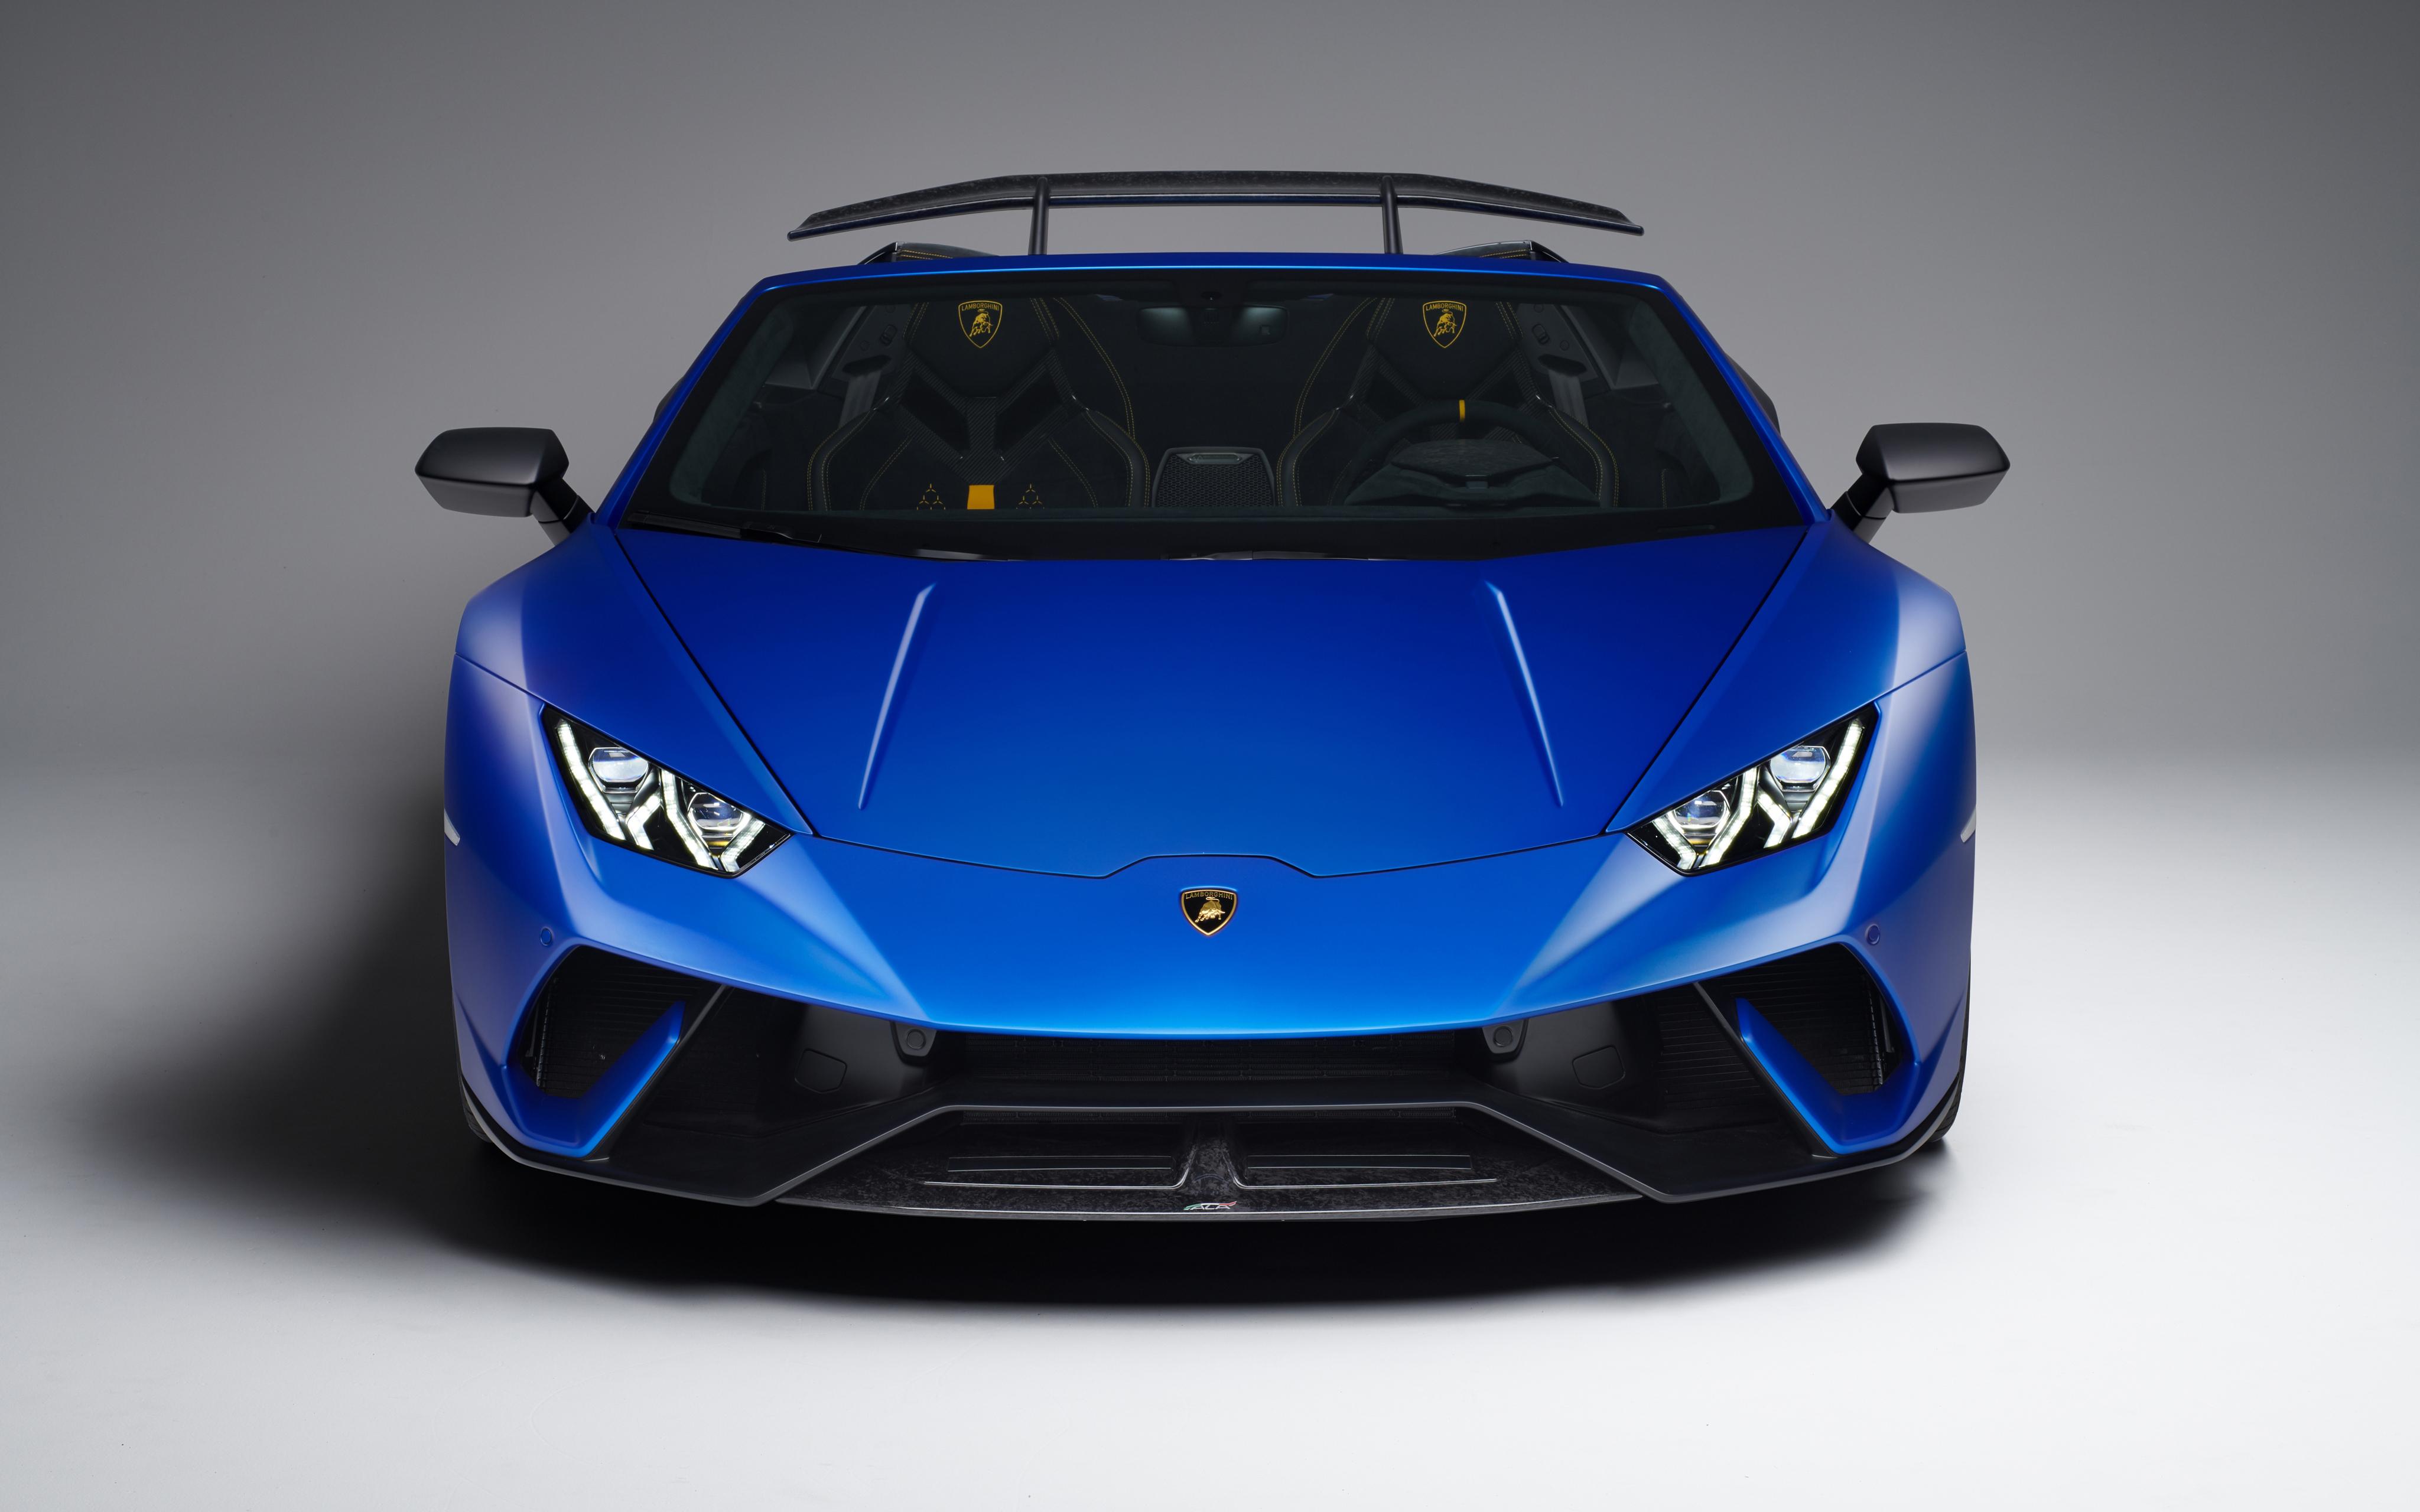 Wallpaper 4k Lamborghini Huracan Perfomante Spyder Geneva 2018 4k